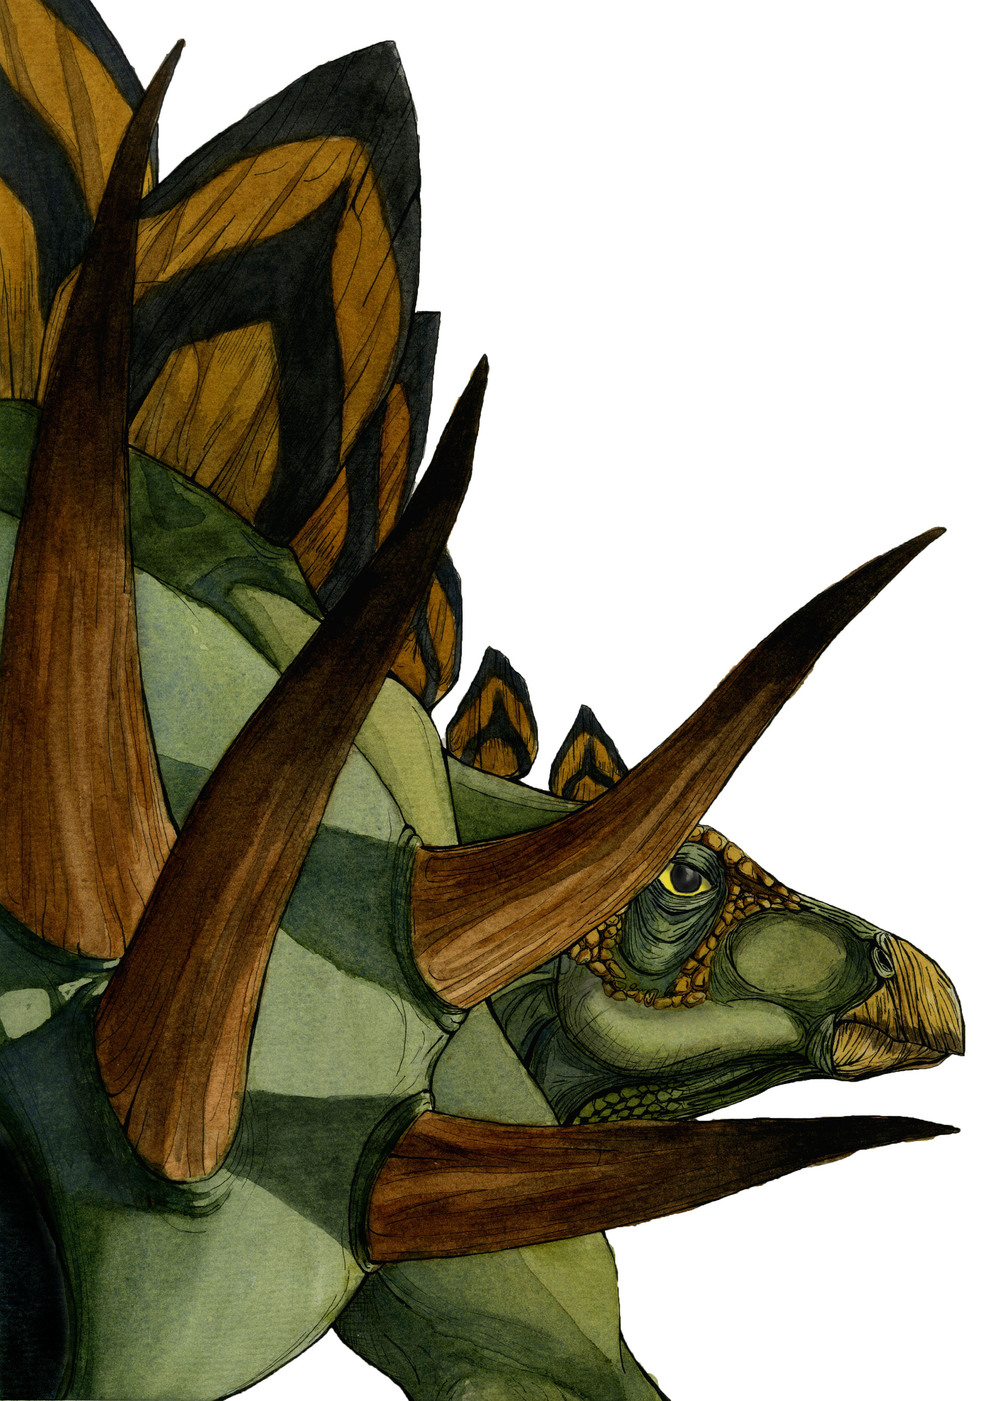 Stegosaurus copy.jpg